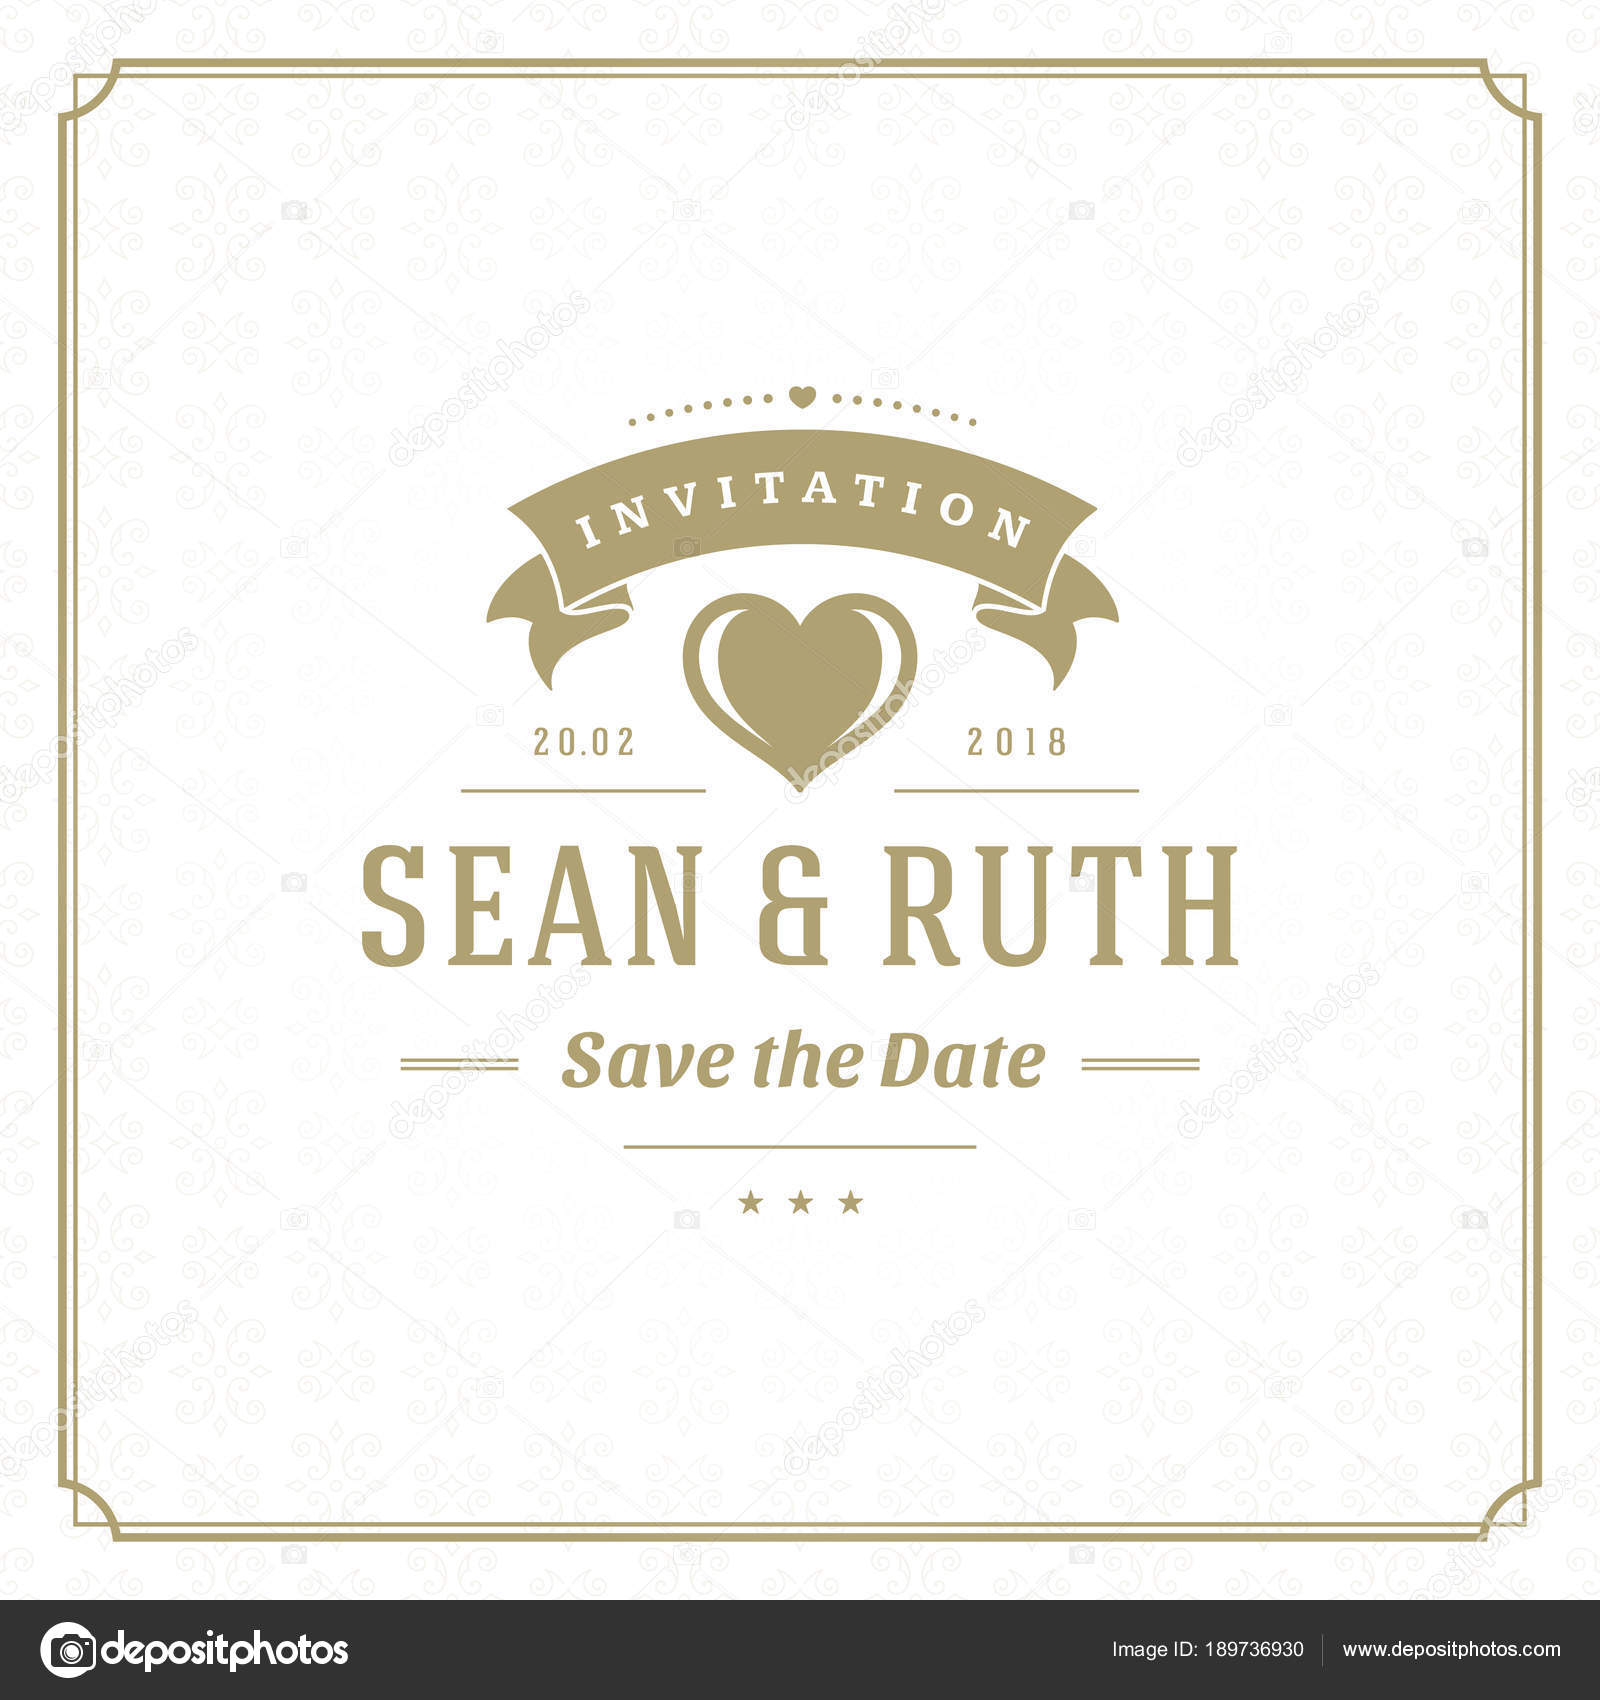 Wedding Date Invitation Card Vector Illustration Wedding Invite Title Vintage Stock Vector C Provectors 189736930